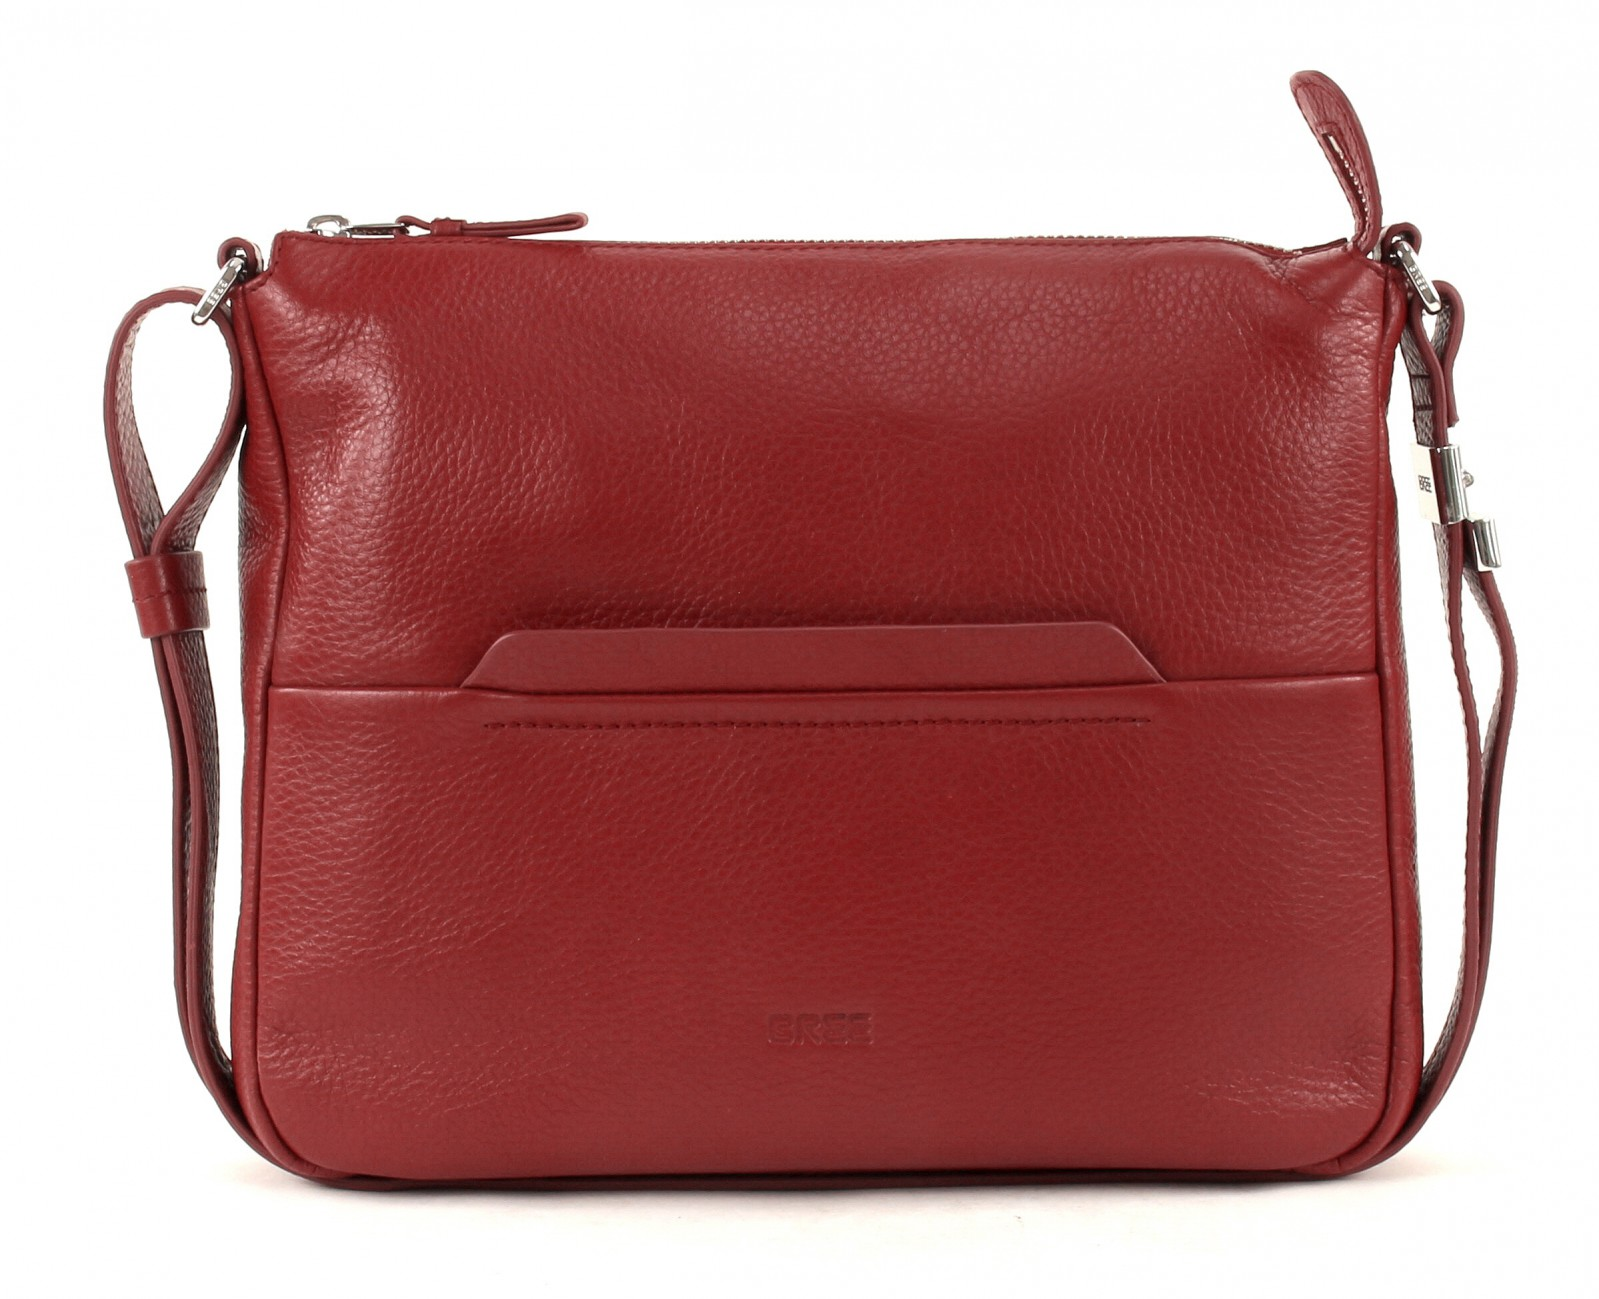 Bree Cross Body Bag Faro 2 Shoulder M Brick Red